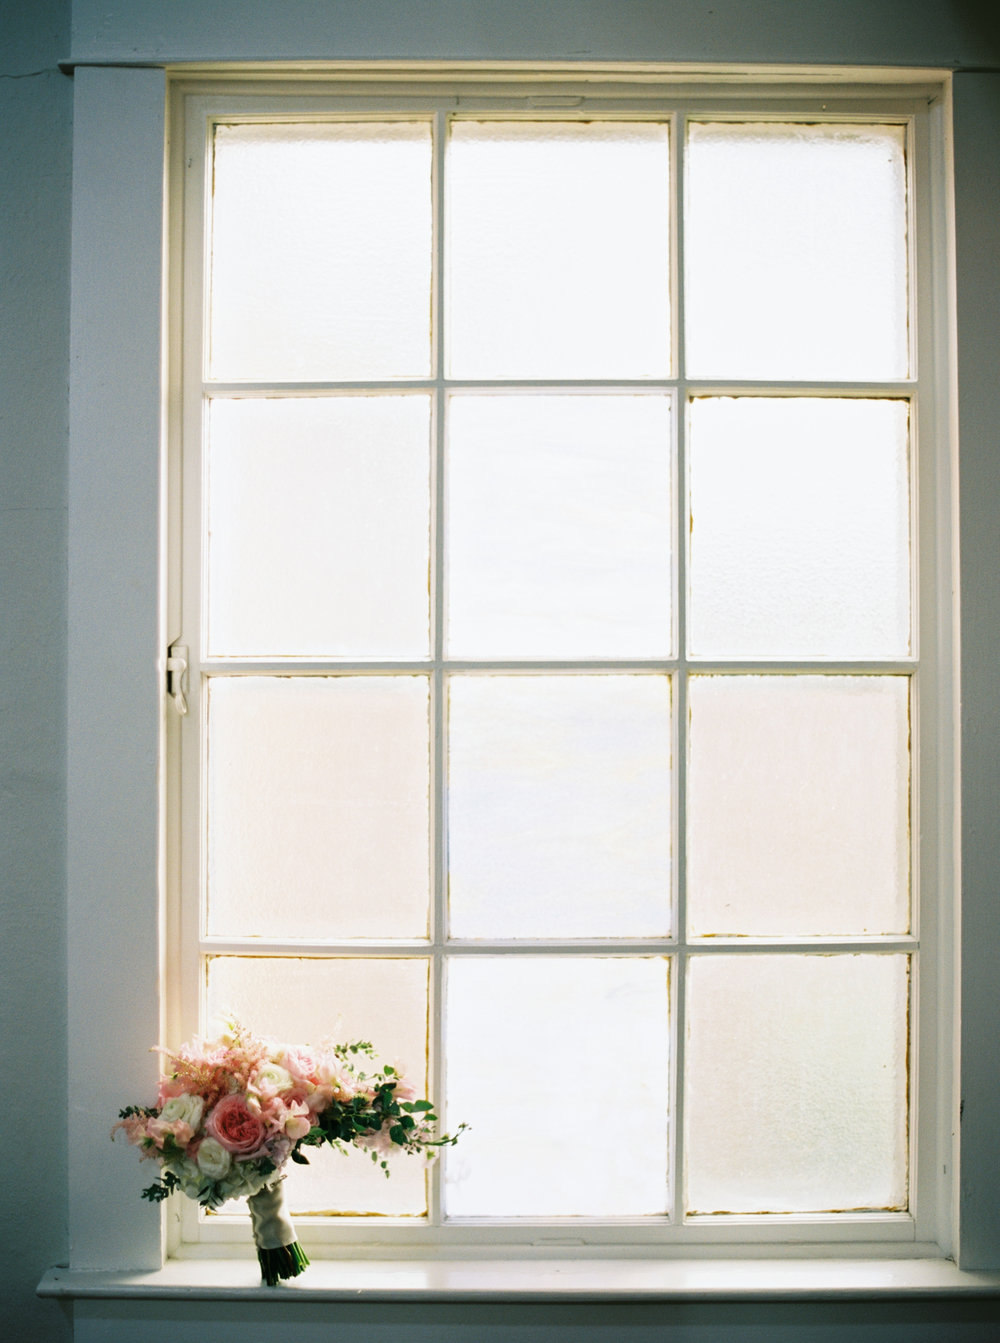 Lydia_johnathan_Wedding_Abigail_Malone_Photography-56.jpg